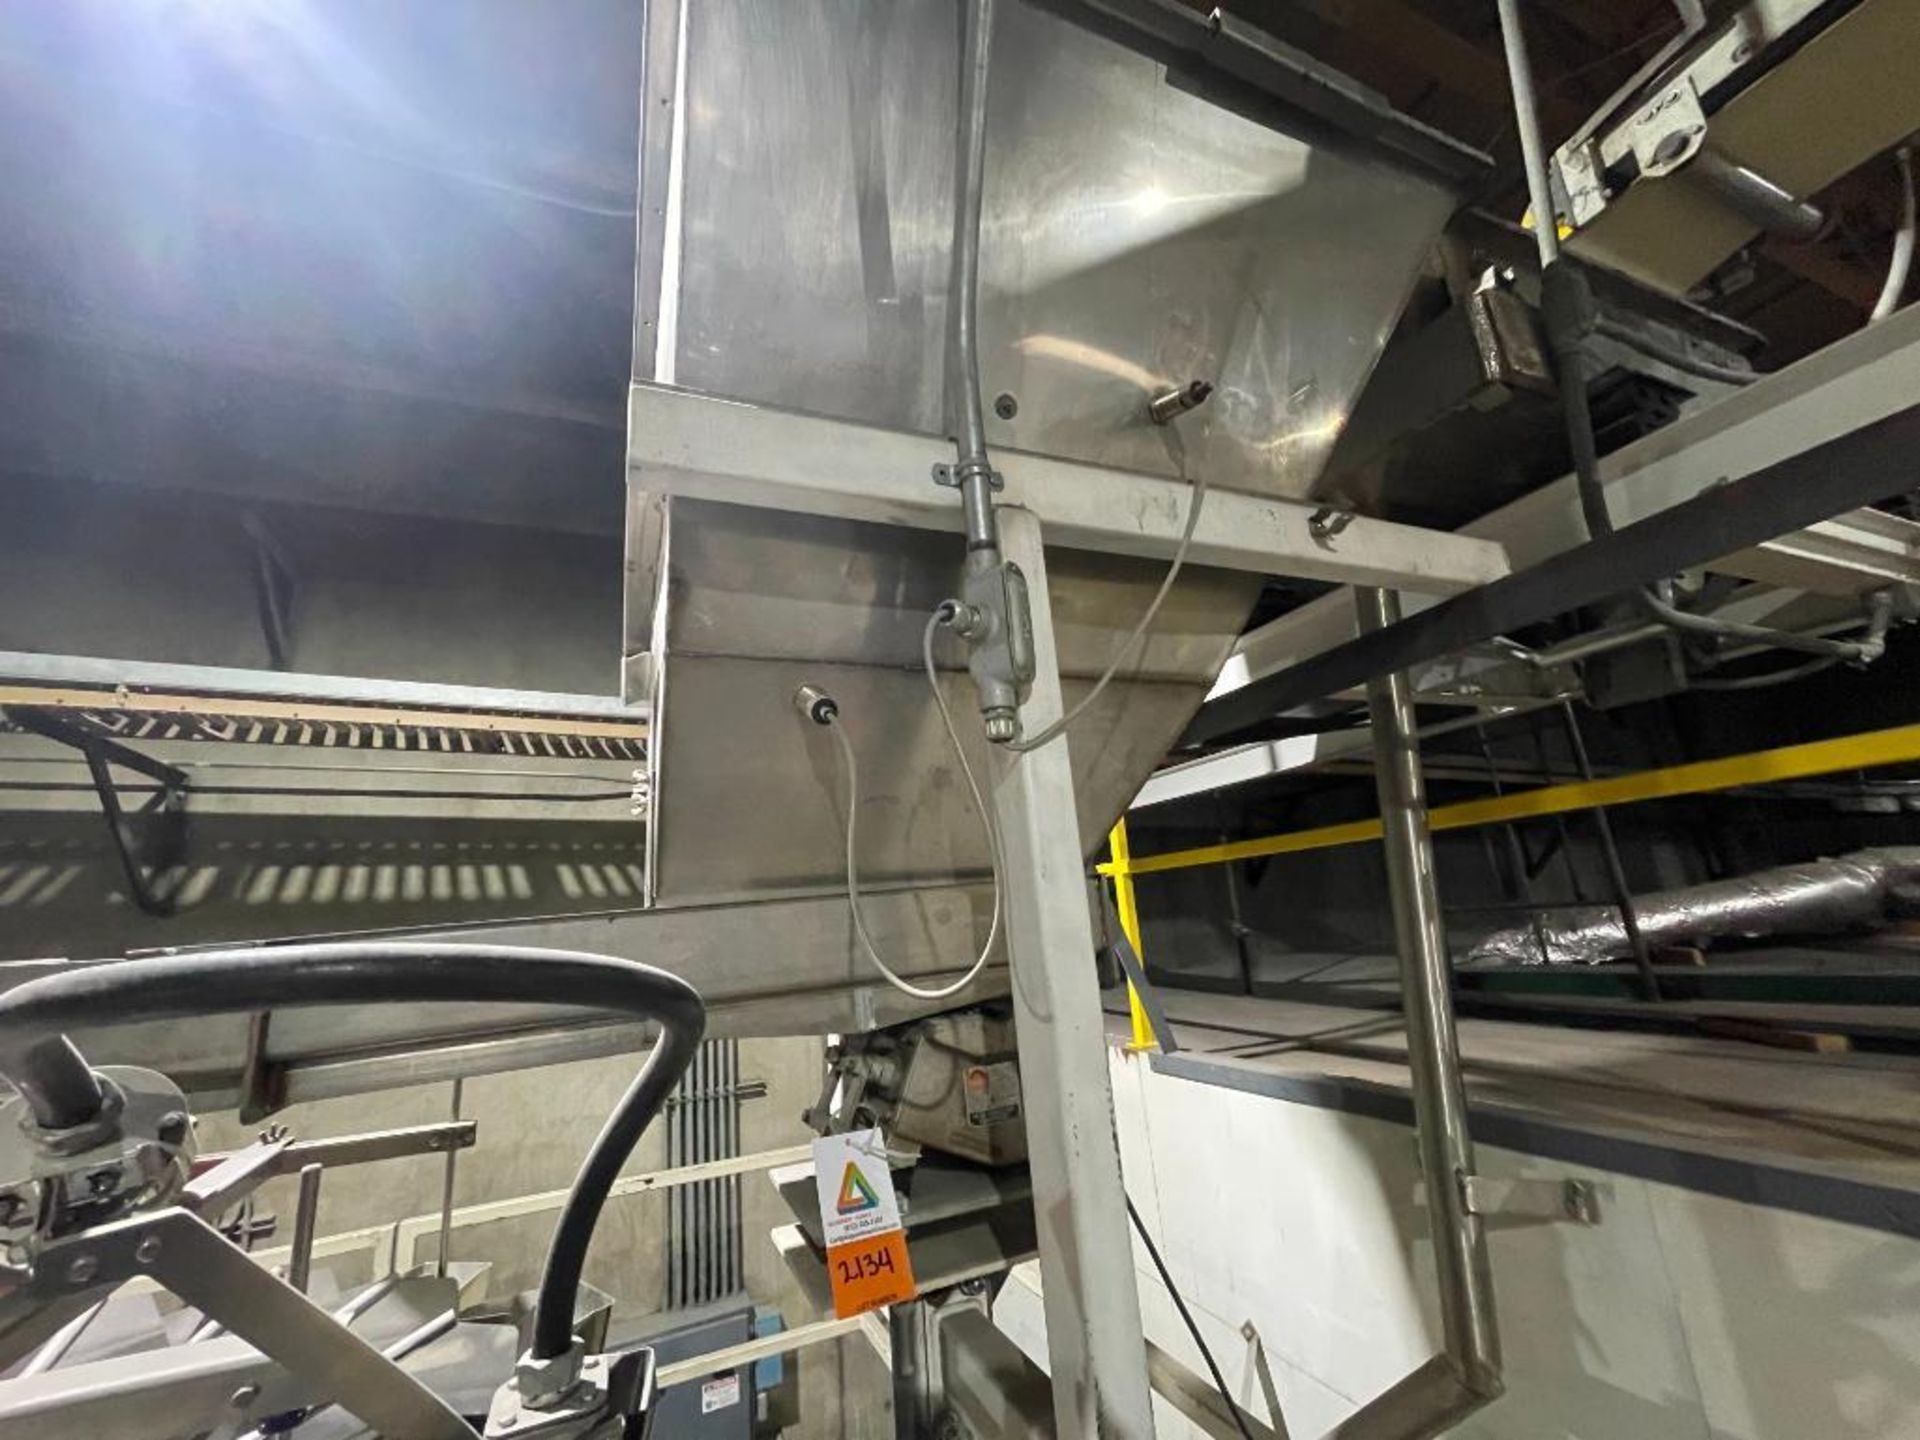 Eriez vibratory conveyor